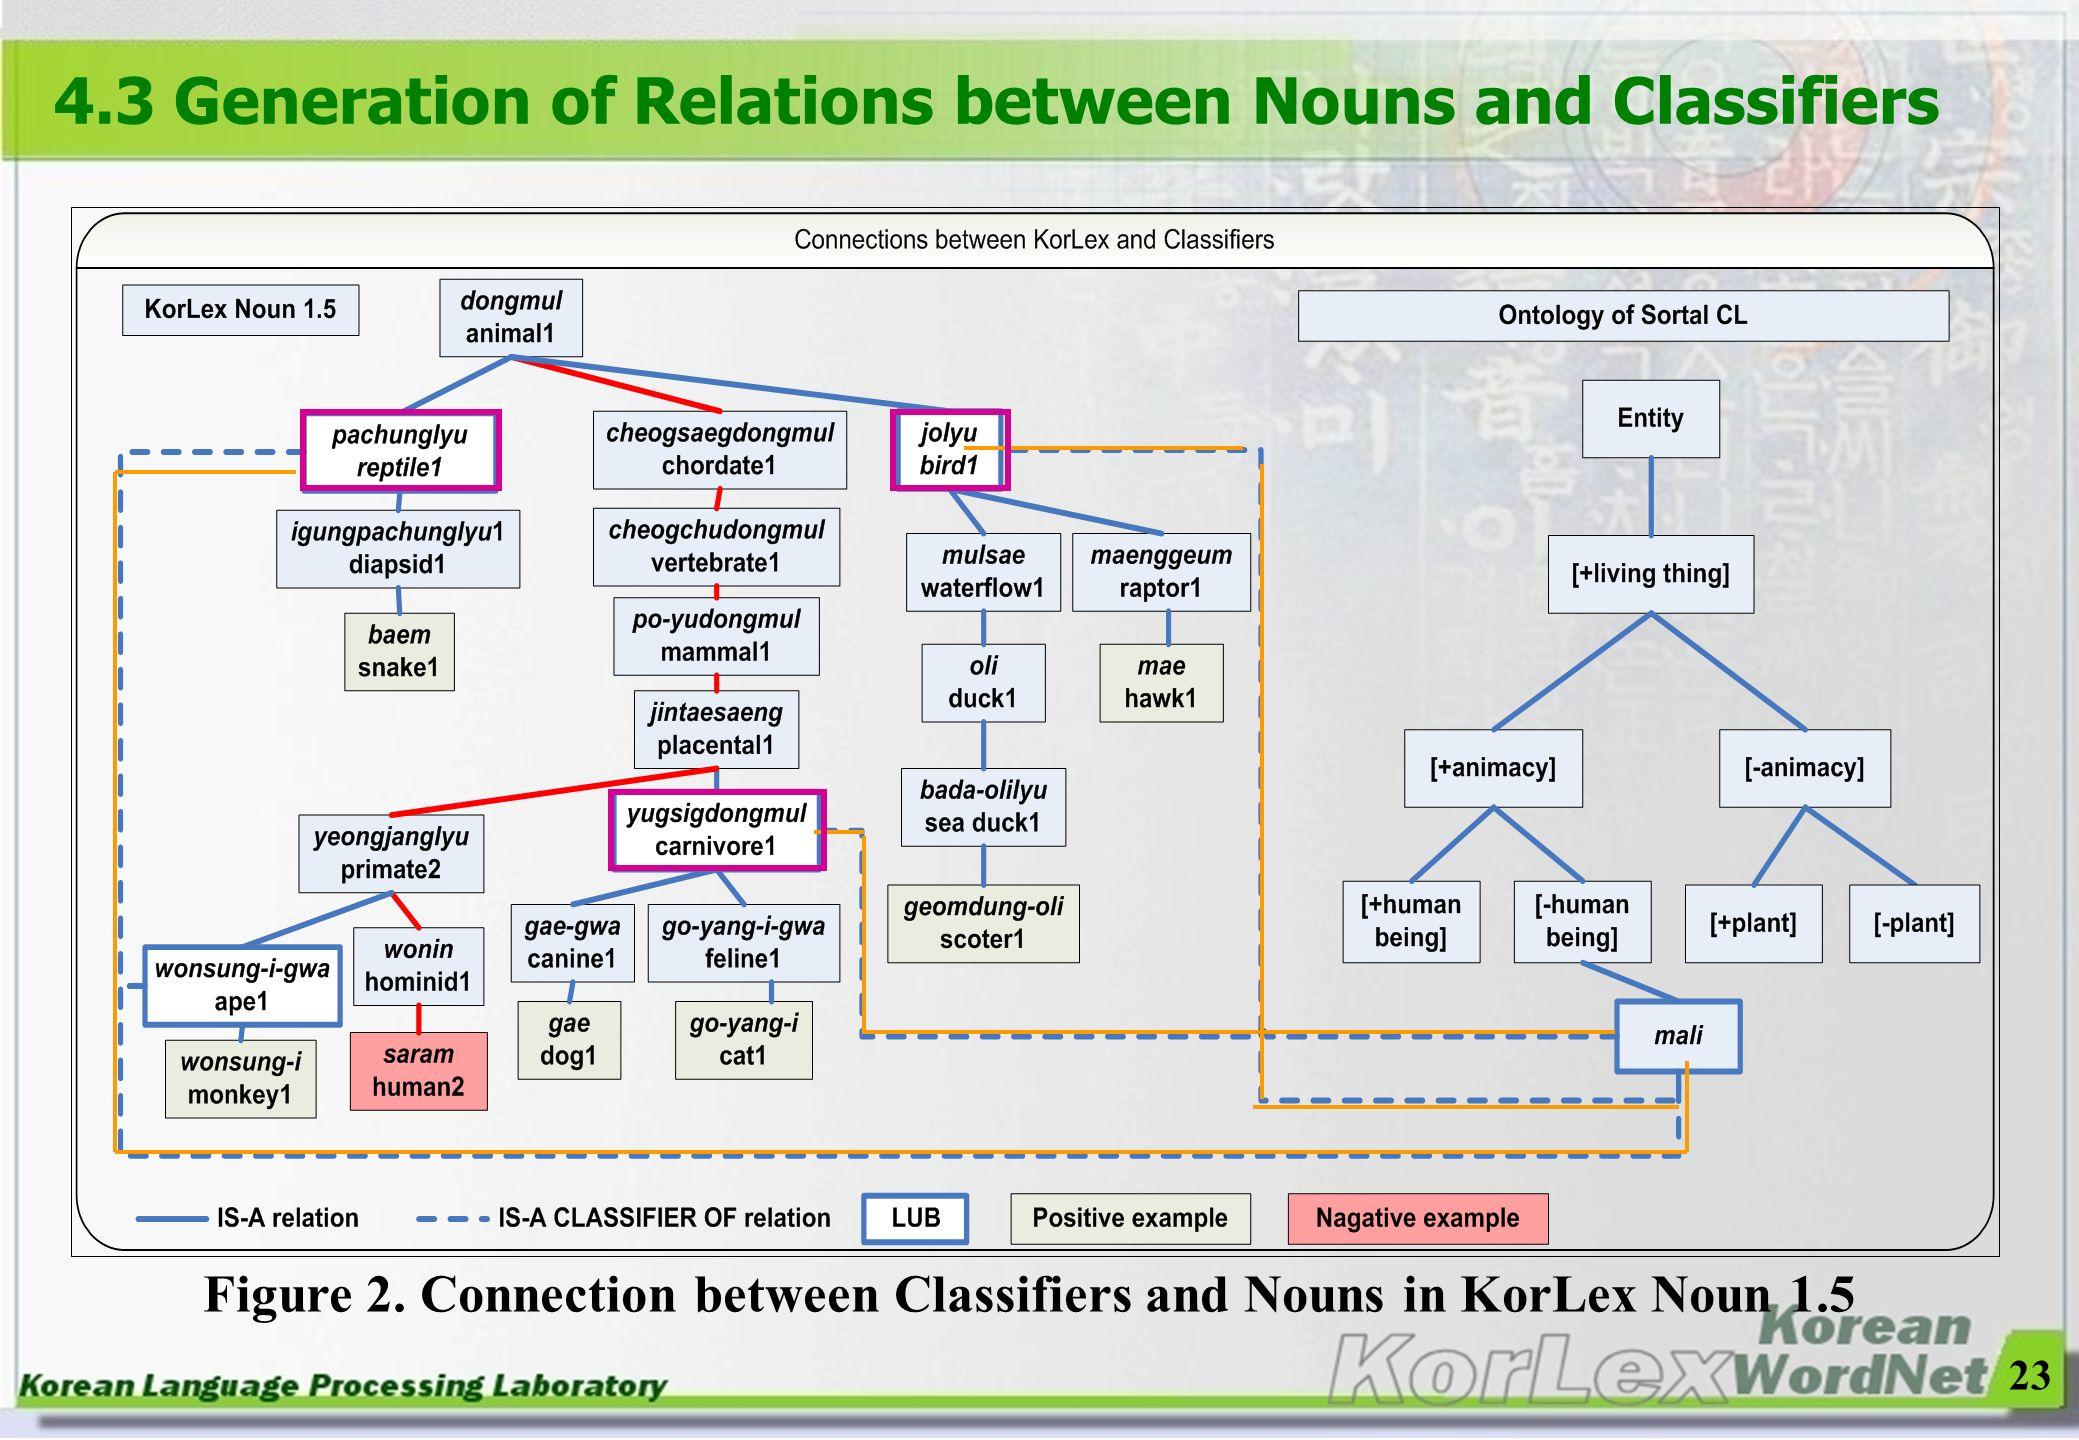 23 4.3 Generation of Relations between Nouns and Classifiers Figure 2. Connection between Classifiers and Nouns in KorLex Noun 1.5